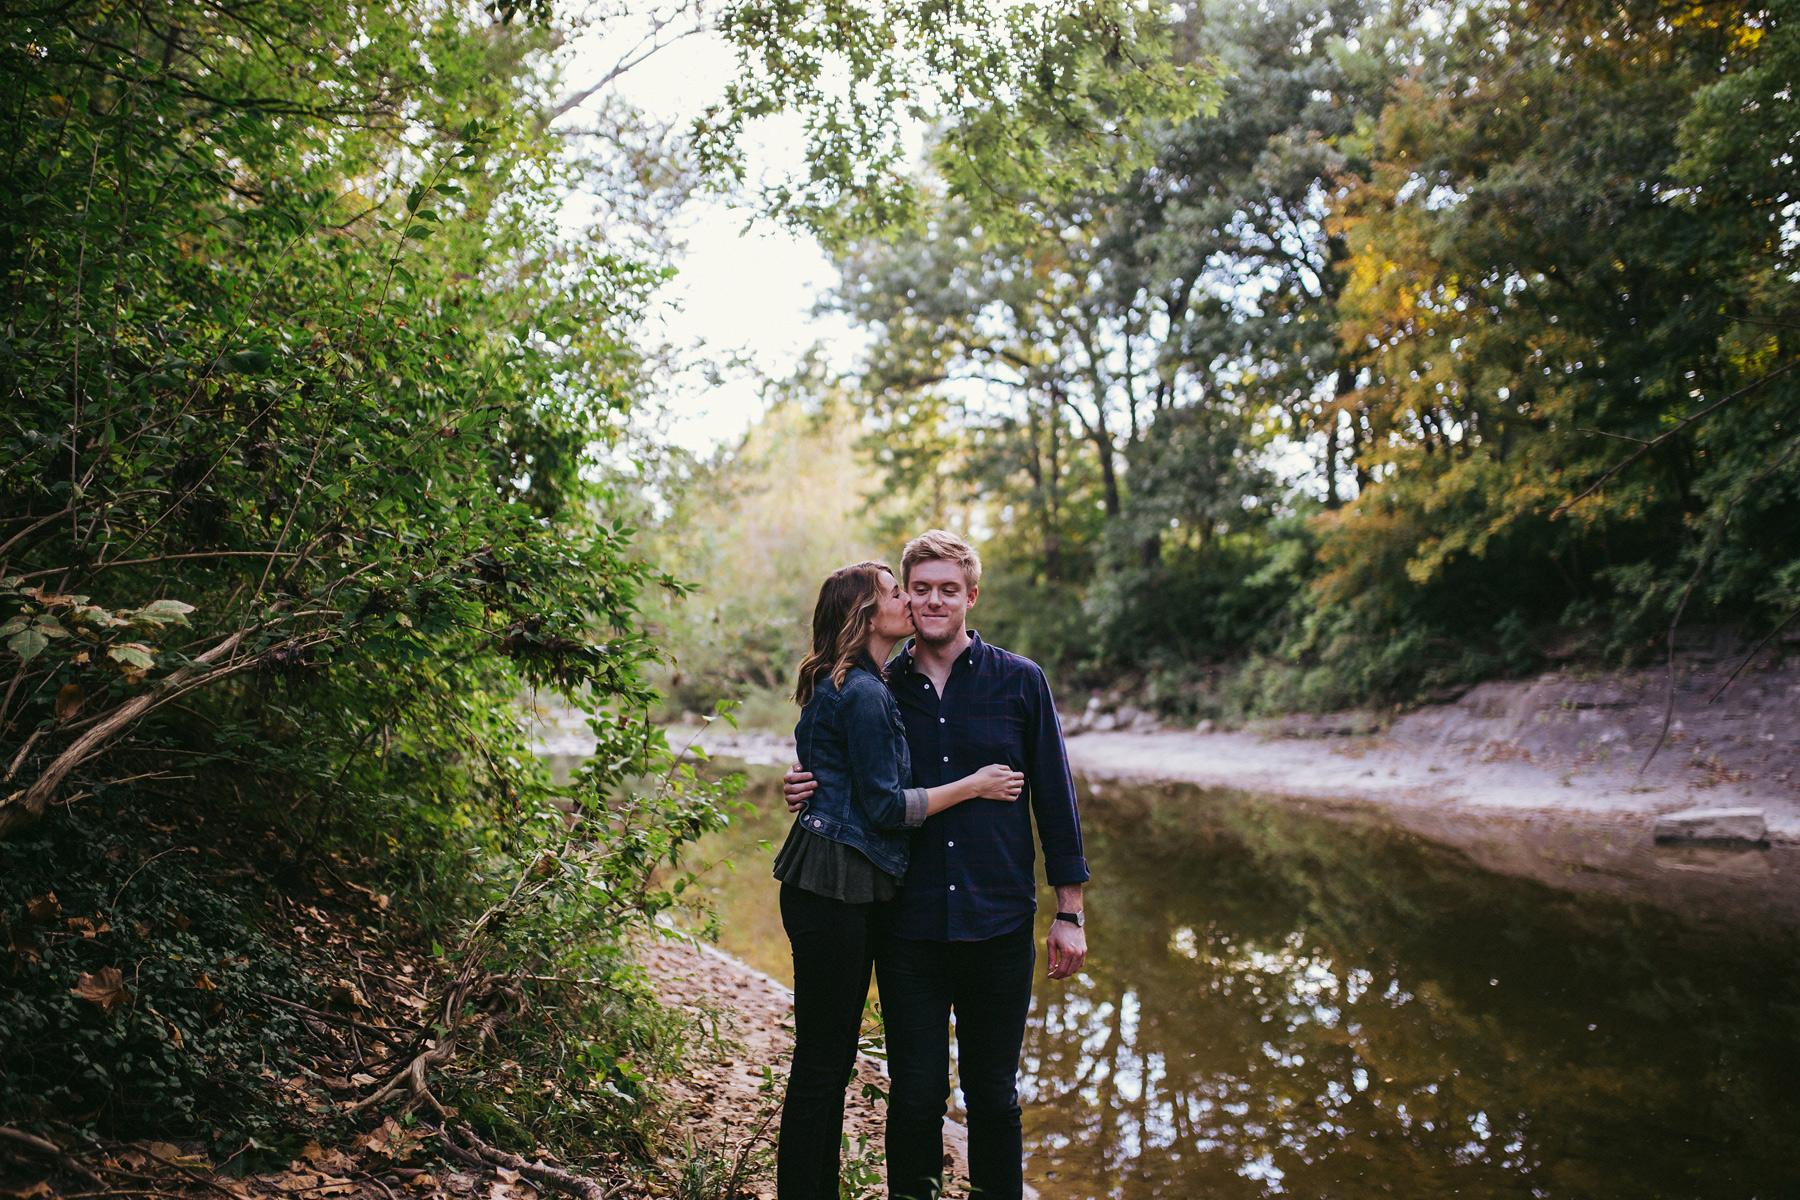 Capen Park Riverside Forest Engagement Photos_Kindling Wedding Photography Blog17.JPG